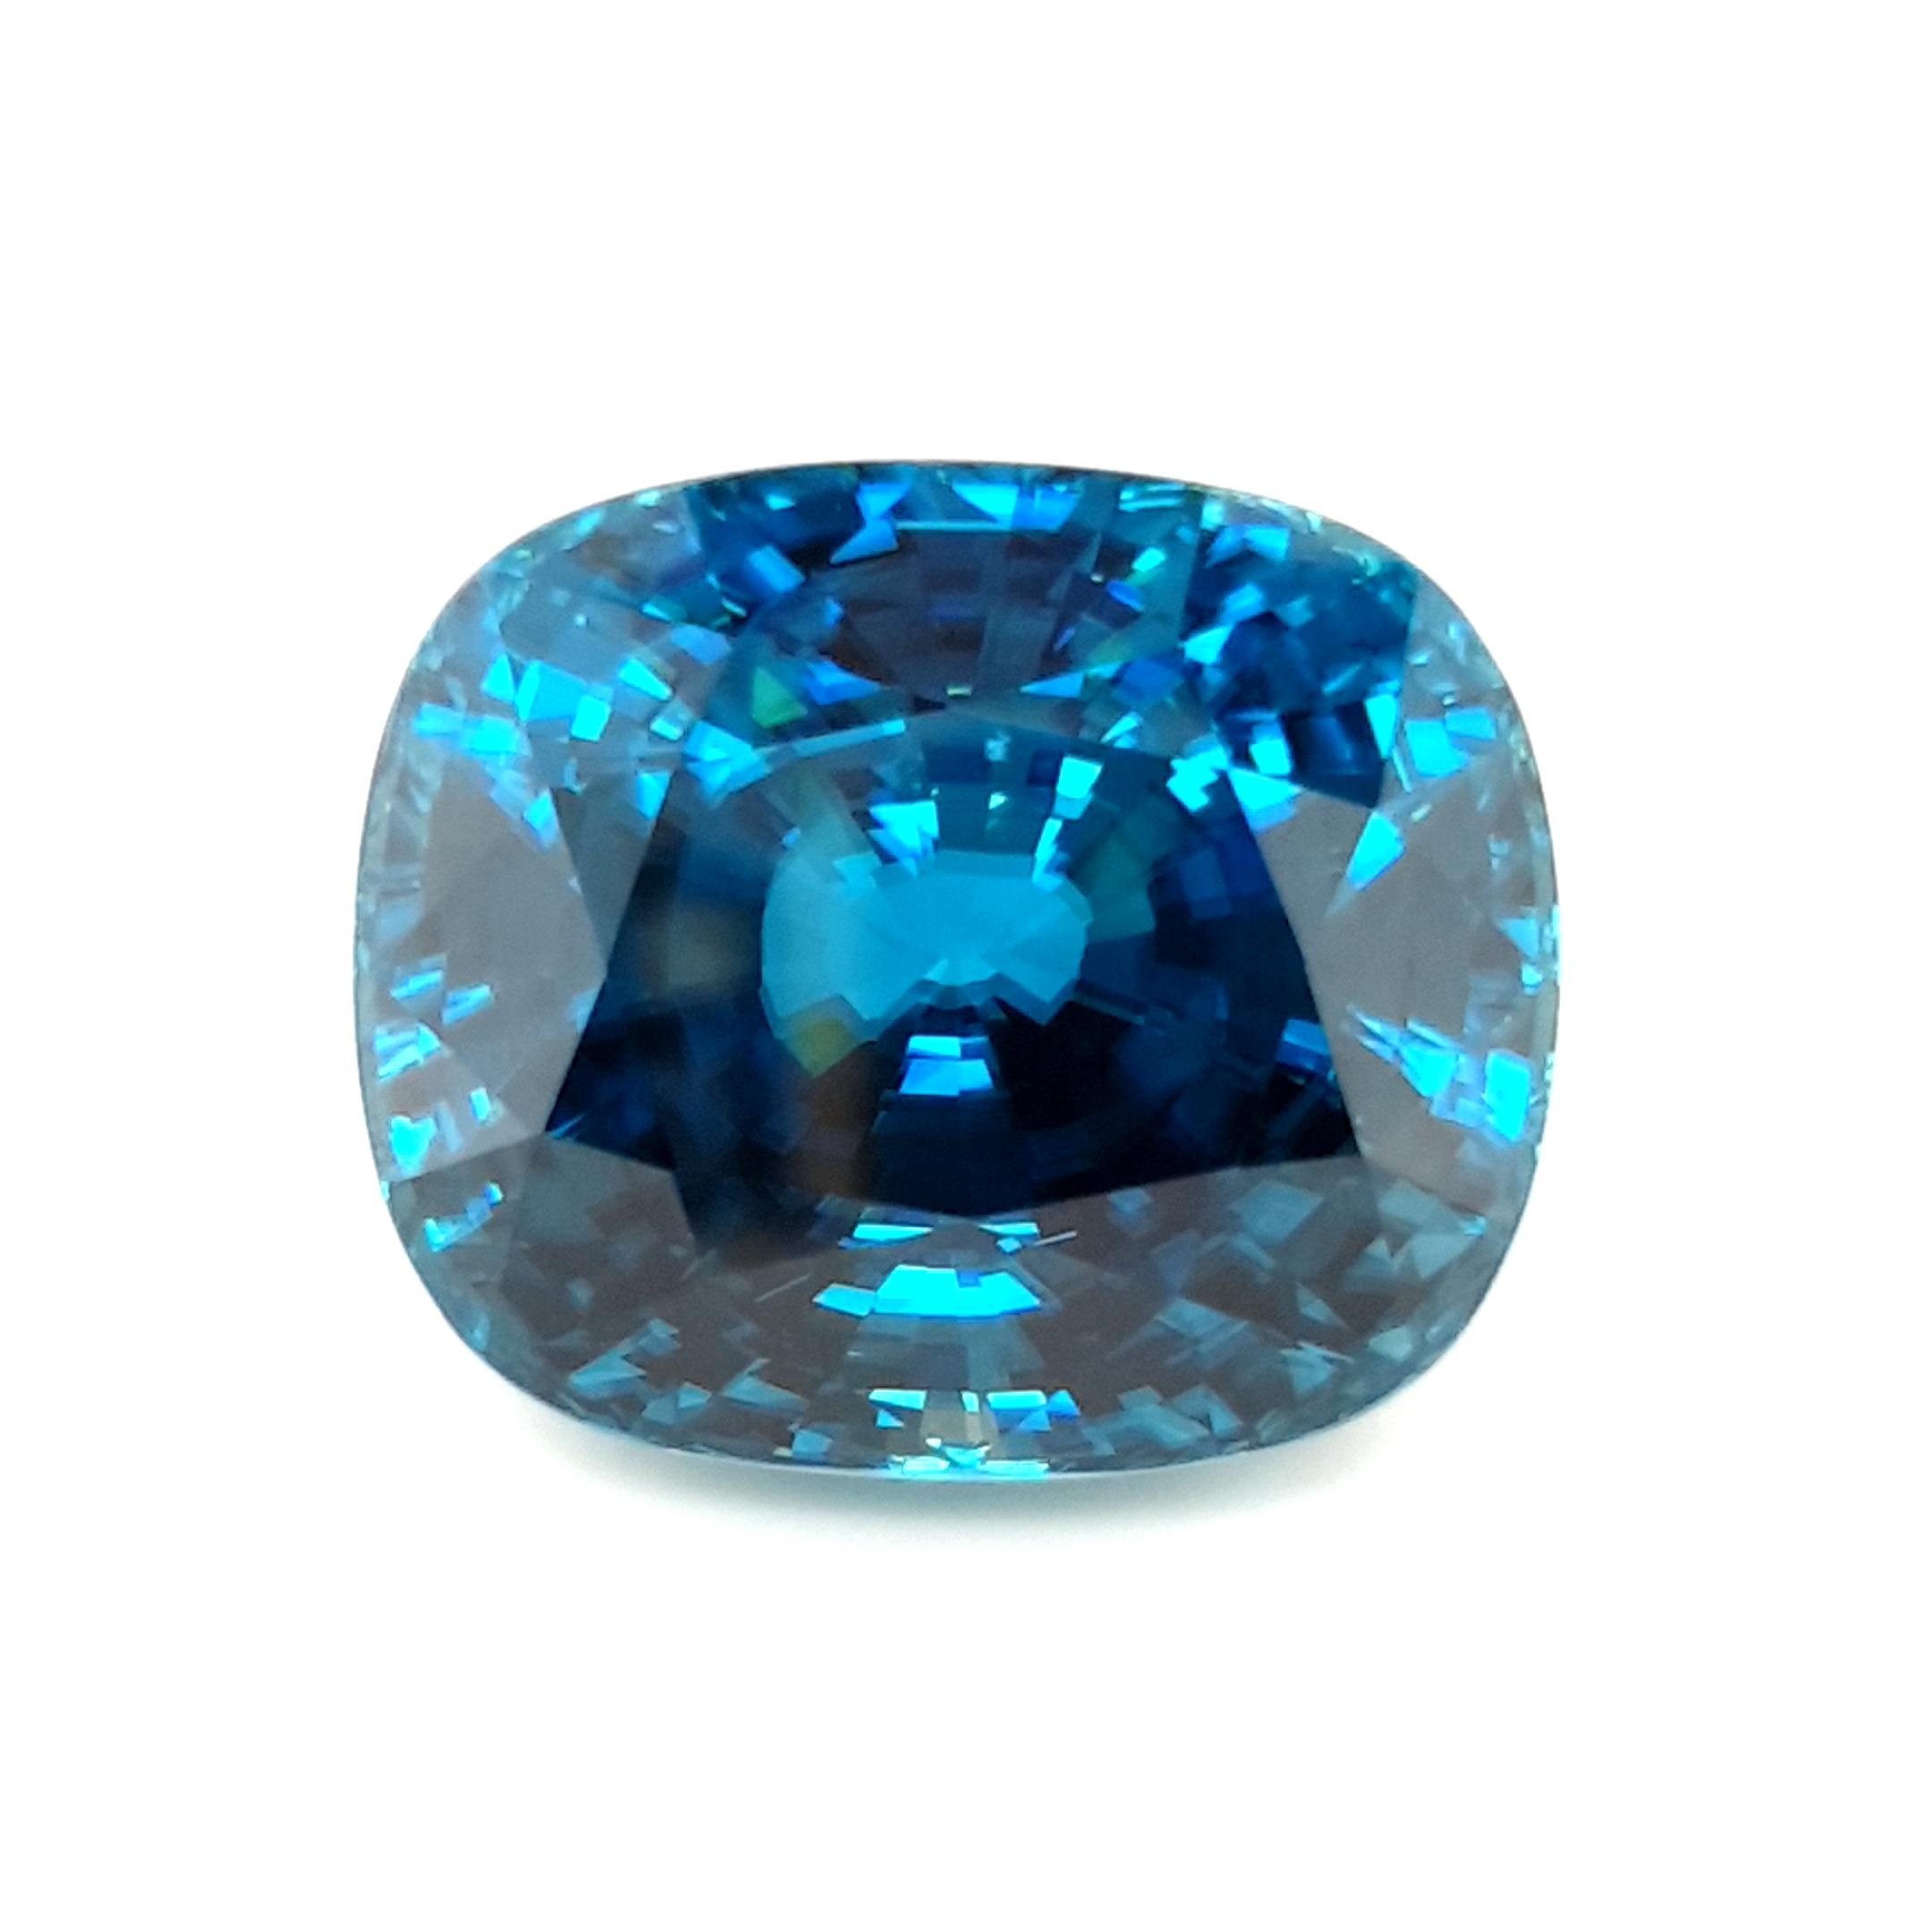 50,46ct. Starlight Blue Zircon ZCF18D1 ClaudiaHamann__2021-04-15-21-31-48